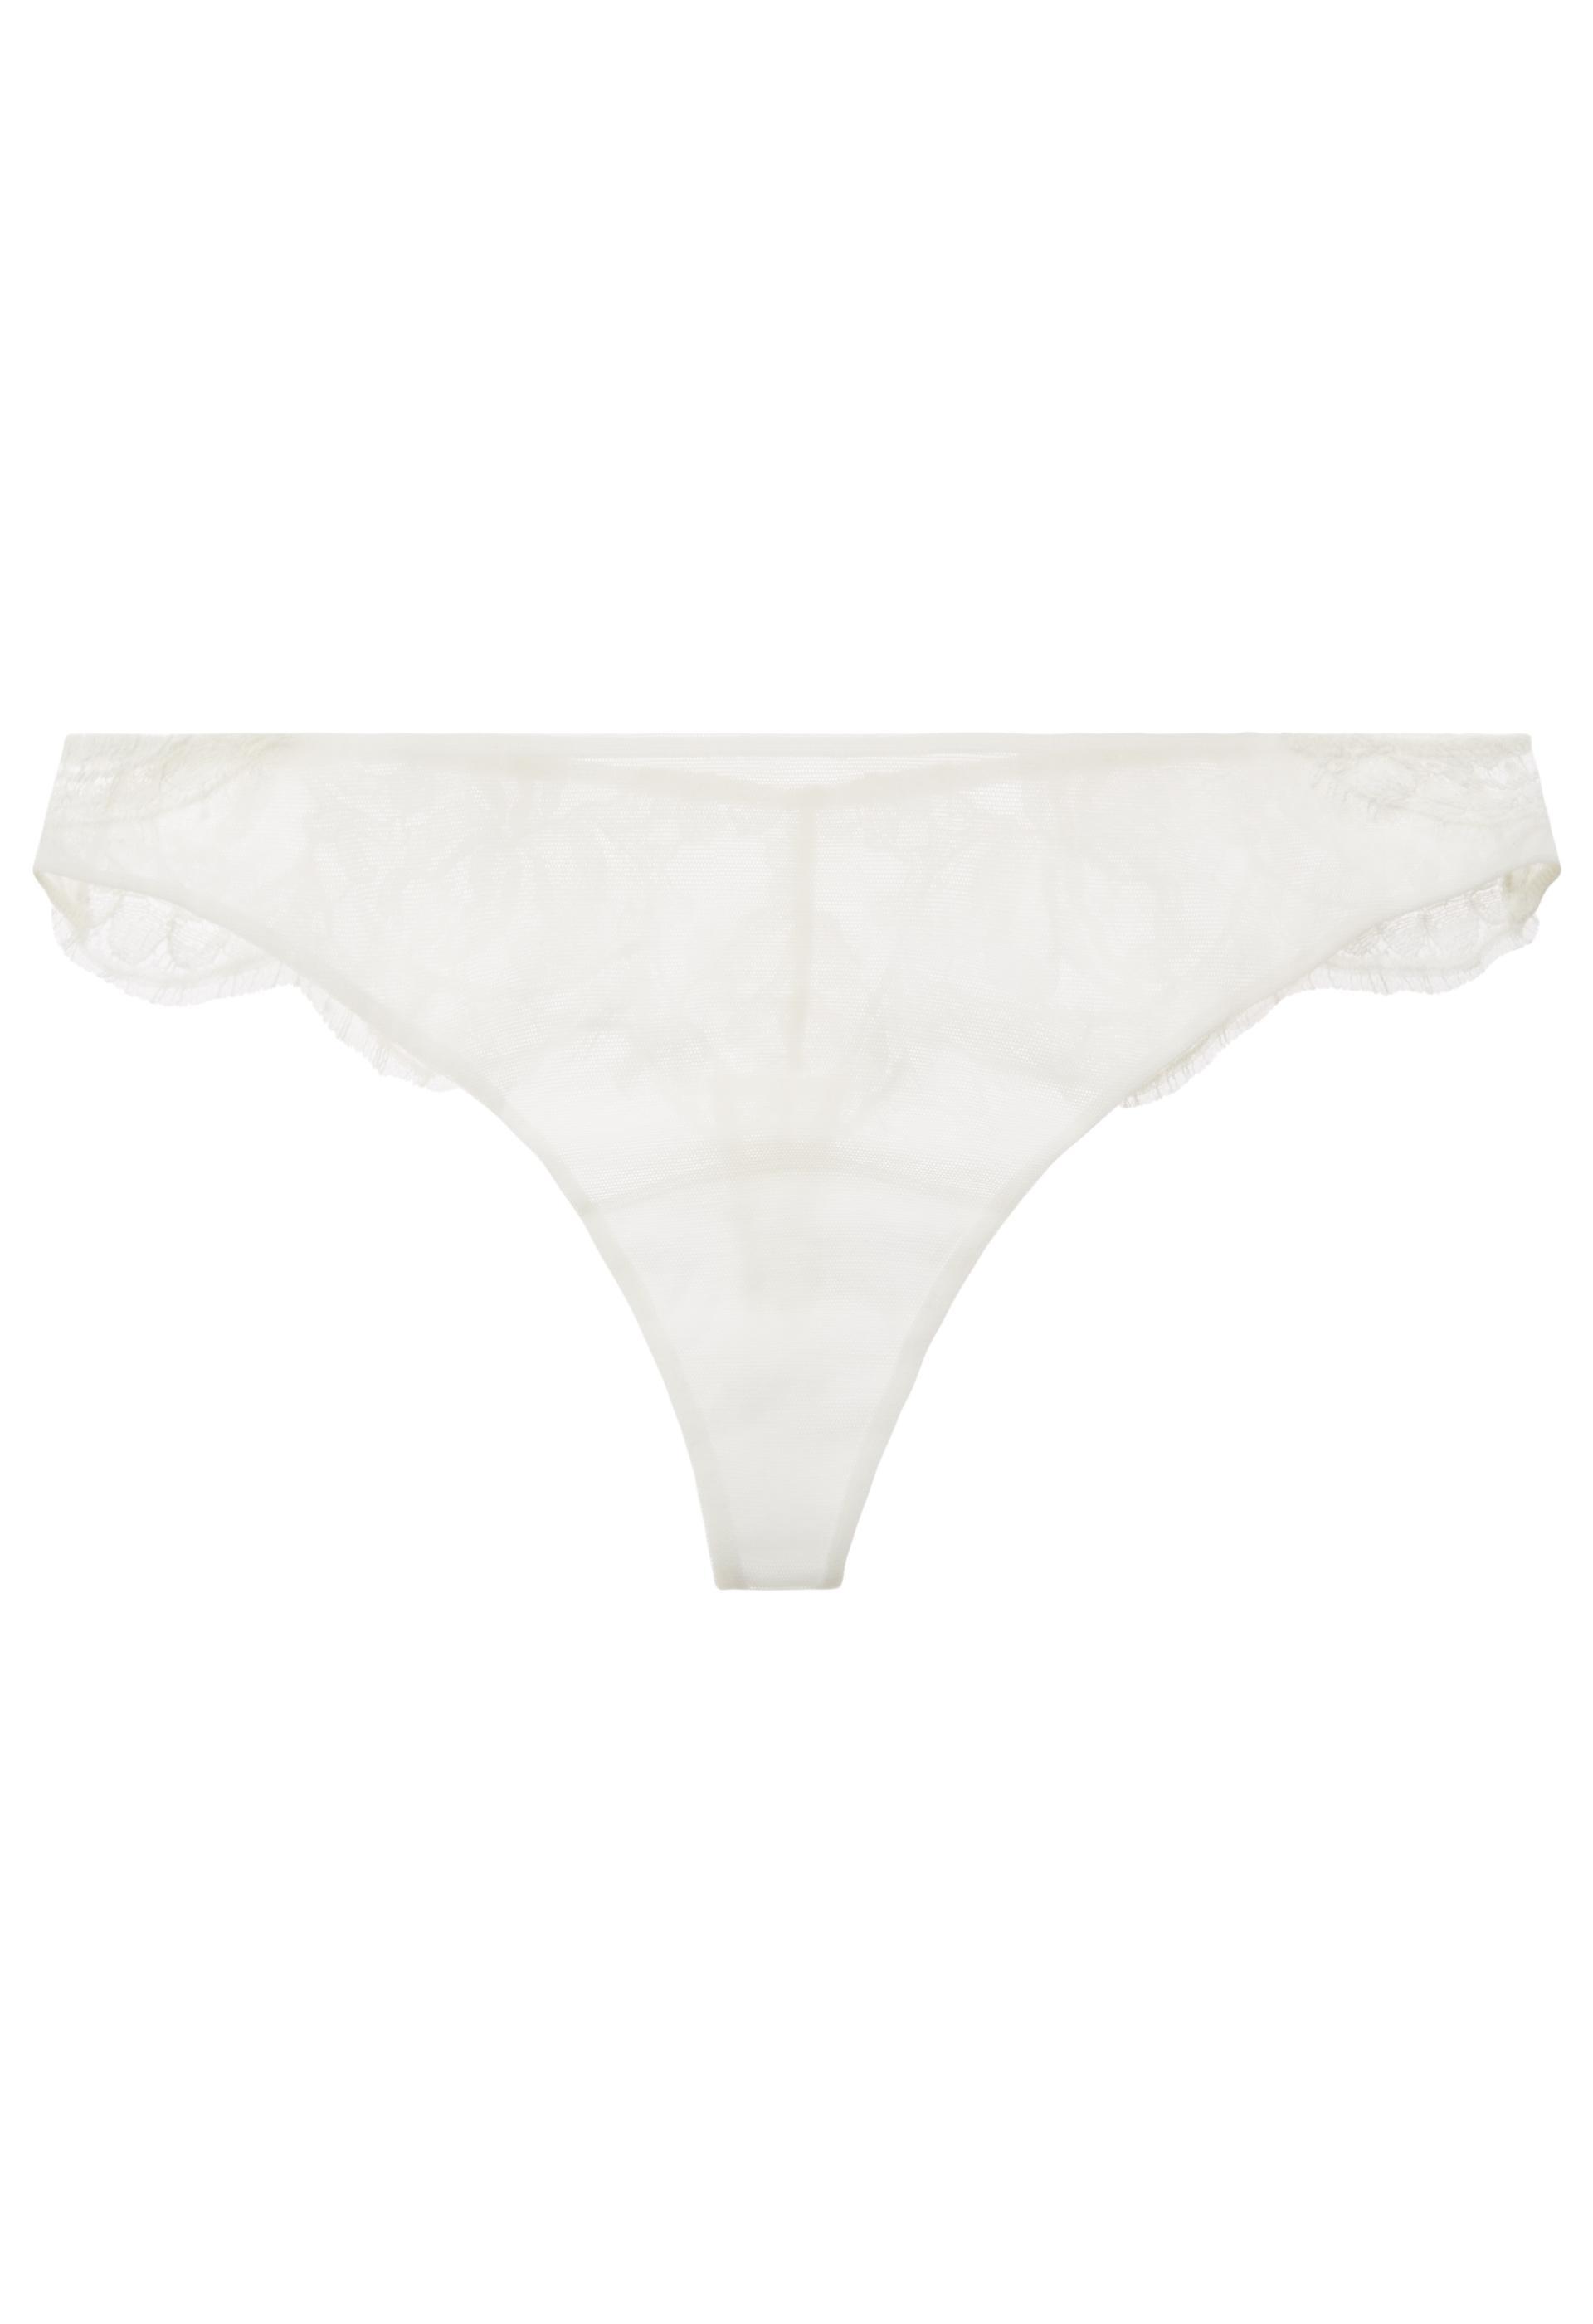 d951d0464888f Lyst - La Perla Lawinia Rose Thong in White